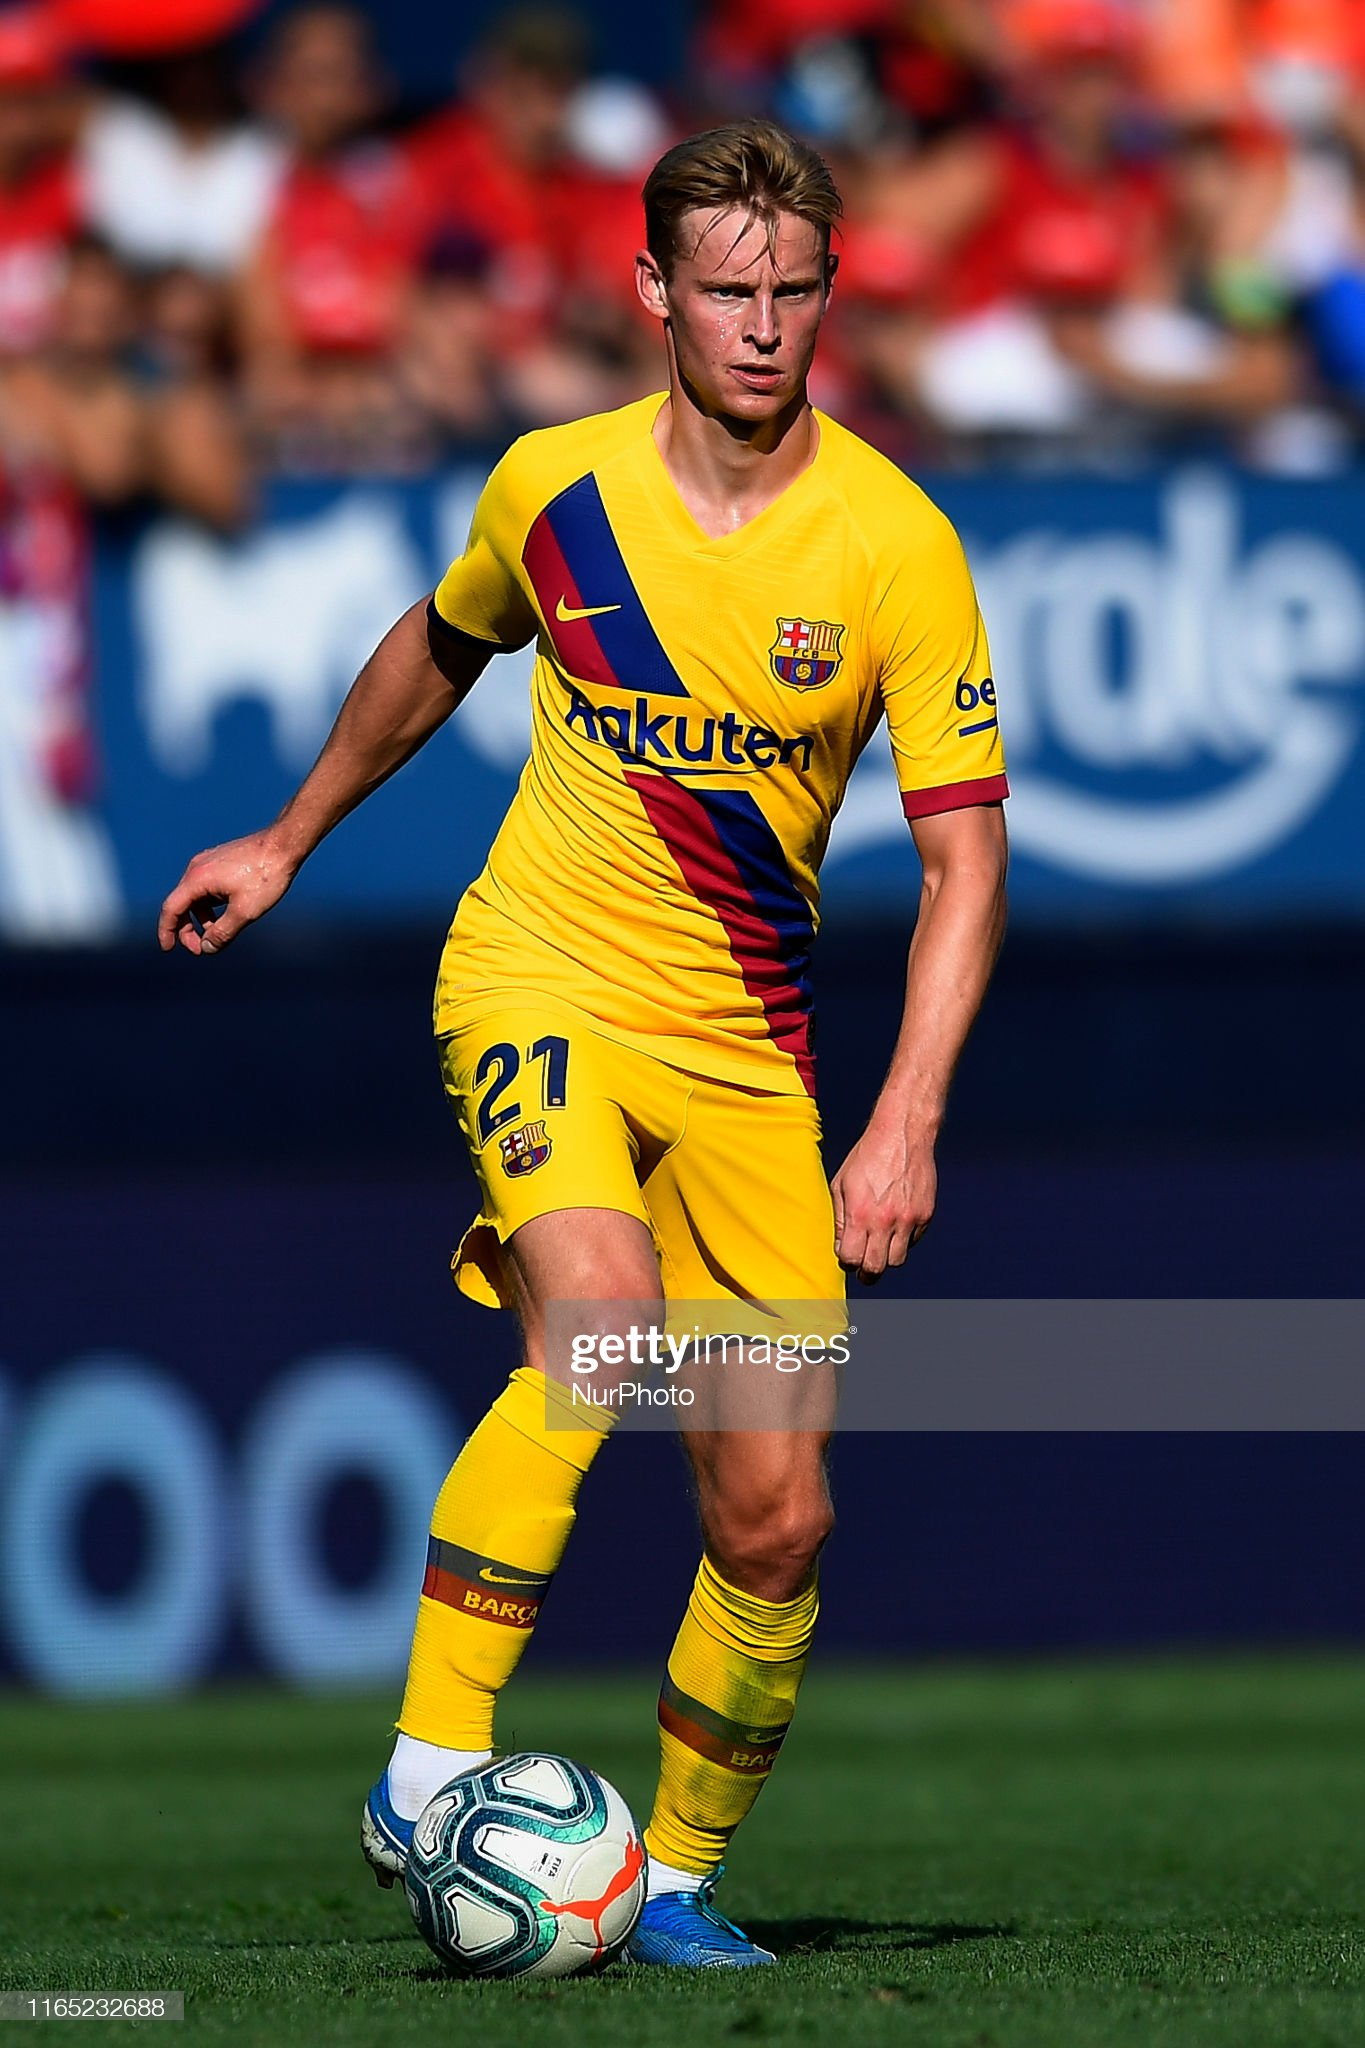 صور مباراة : أوساسونا - برشلونة 2-2 ( 31-08-2019 )  Frenkie-de-jong-of-barcelona-in-action-during-the-liga-match-between-picture-id1165232688?s=2048x2048